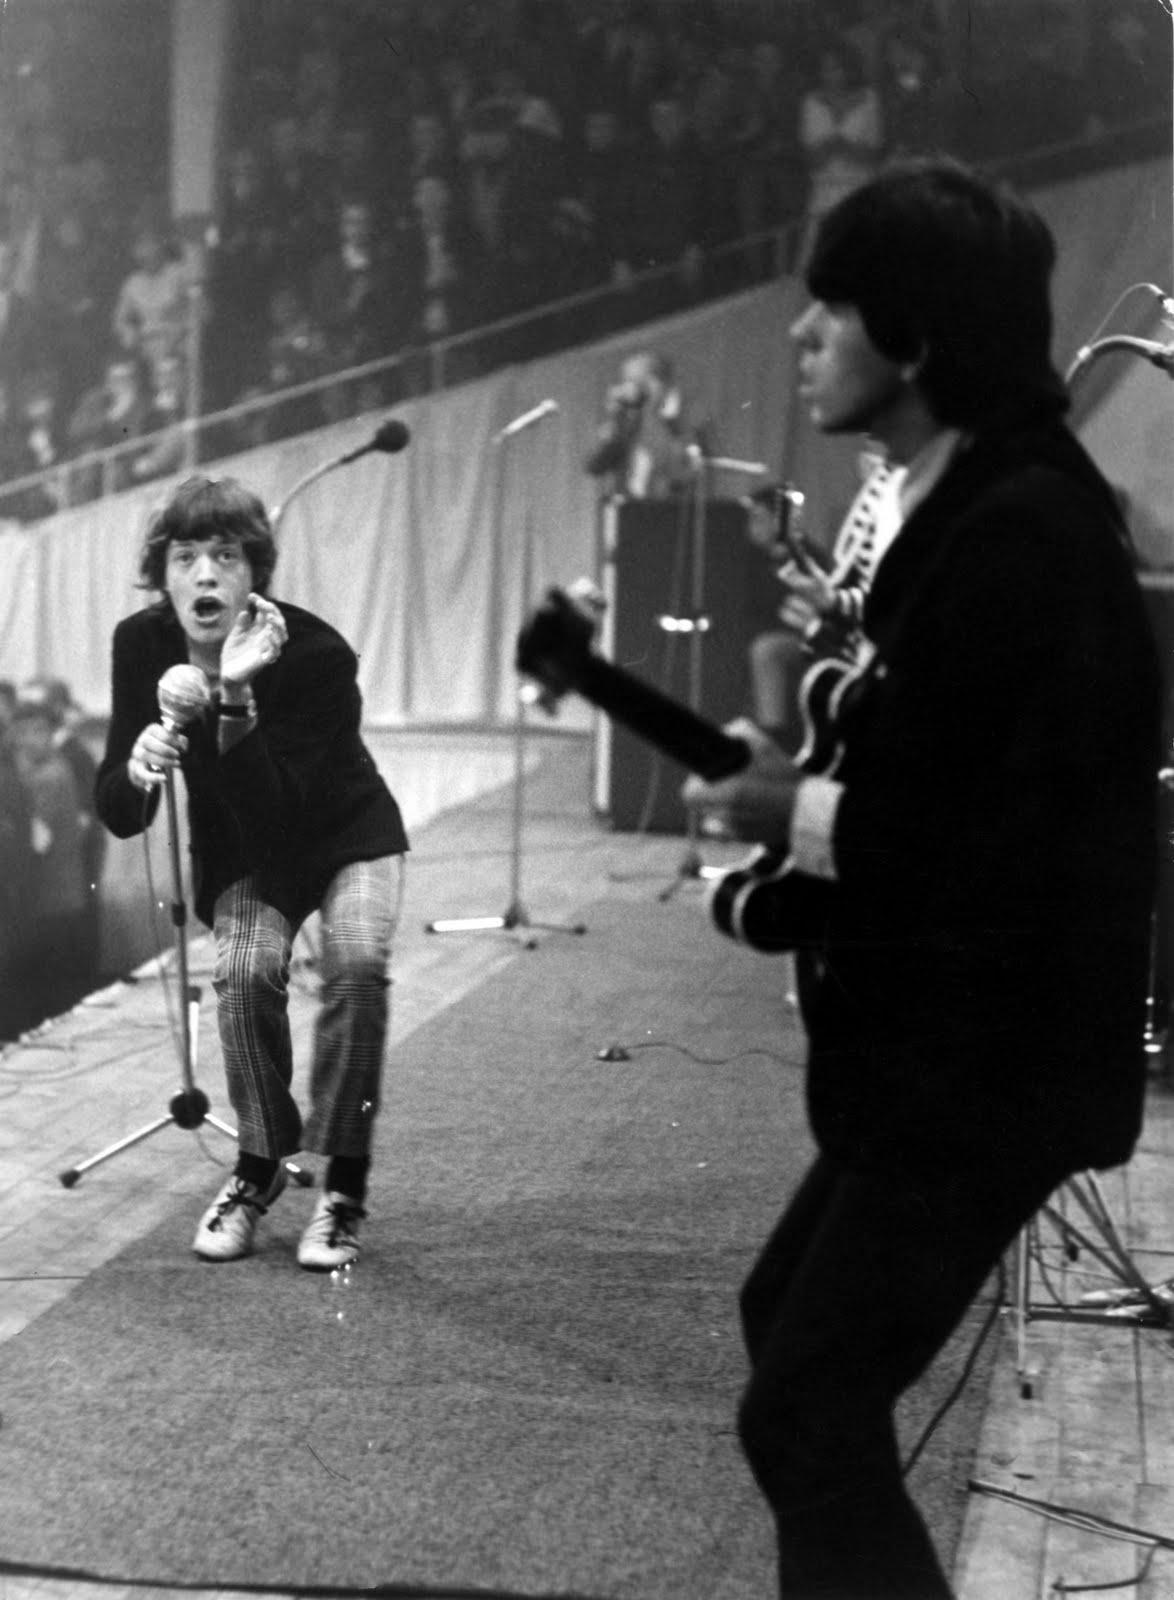 Cameron K's Blog: Rock Shoes Part II (1963 – 1979)